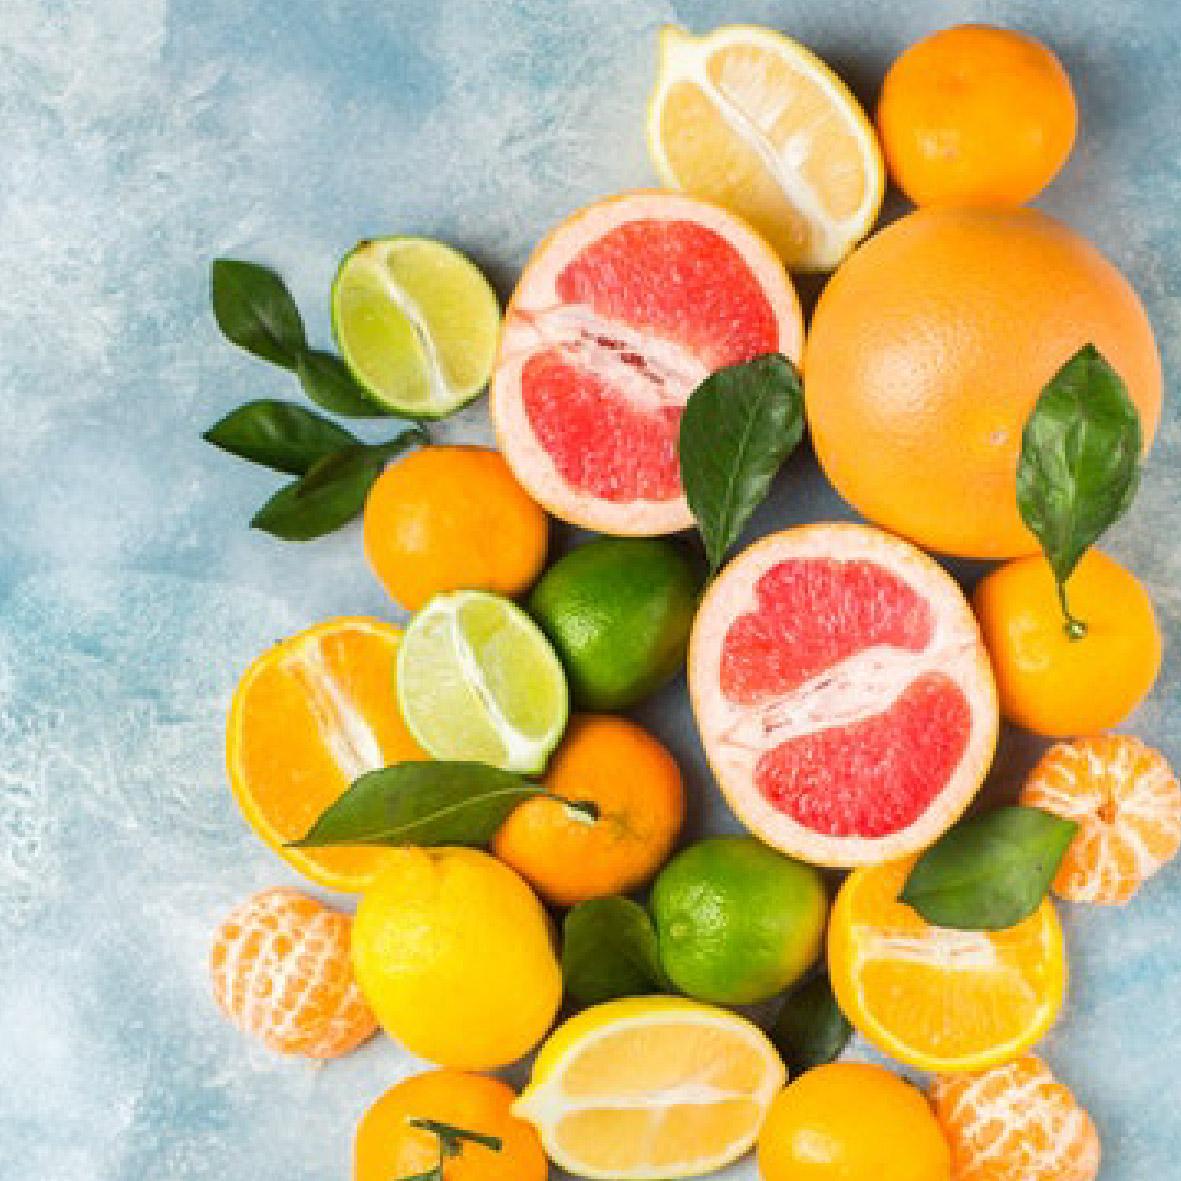 Jus yang Dapat MembantuMeningkatkan Imunitas